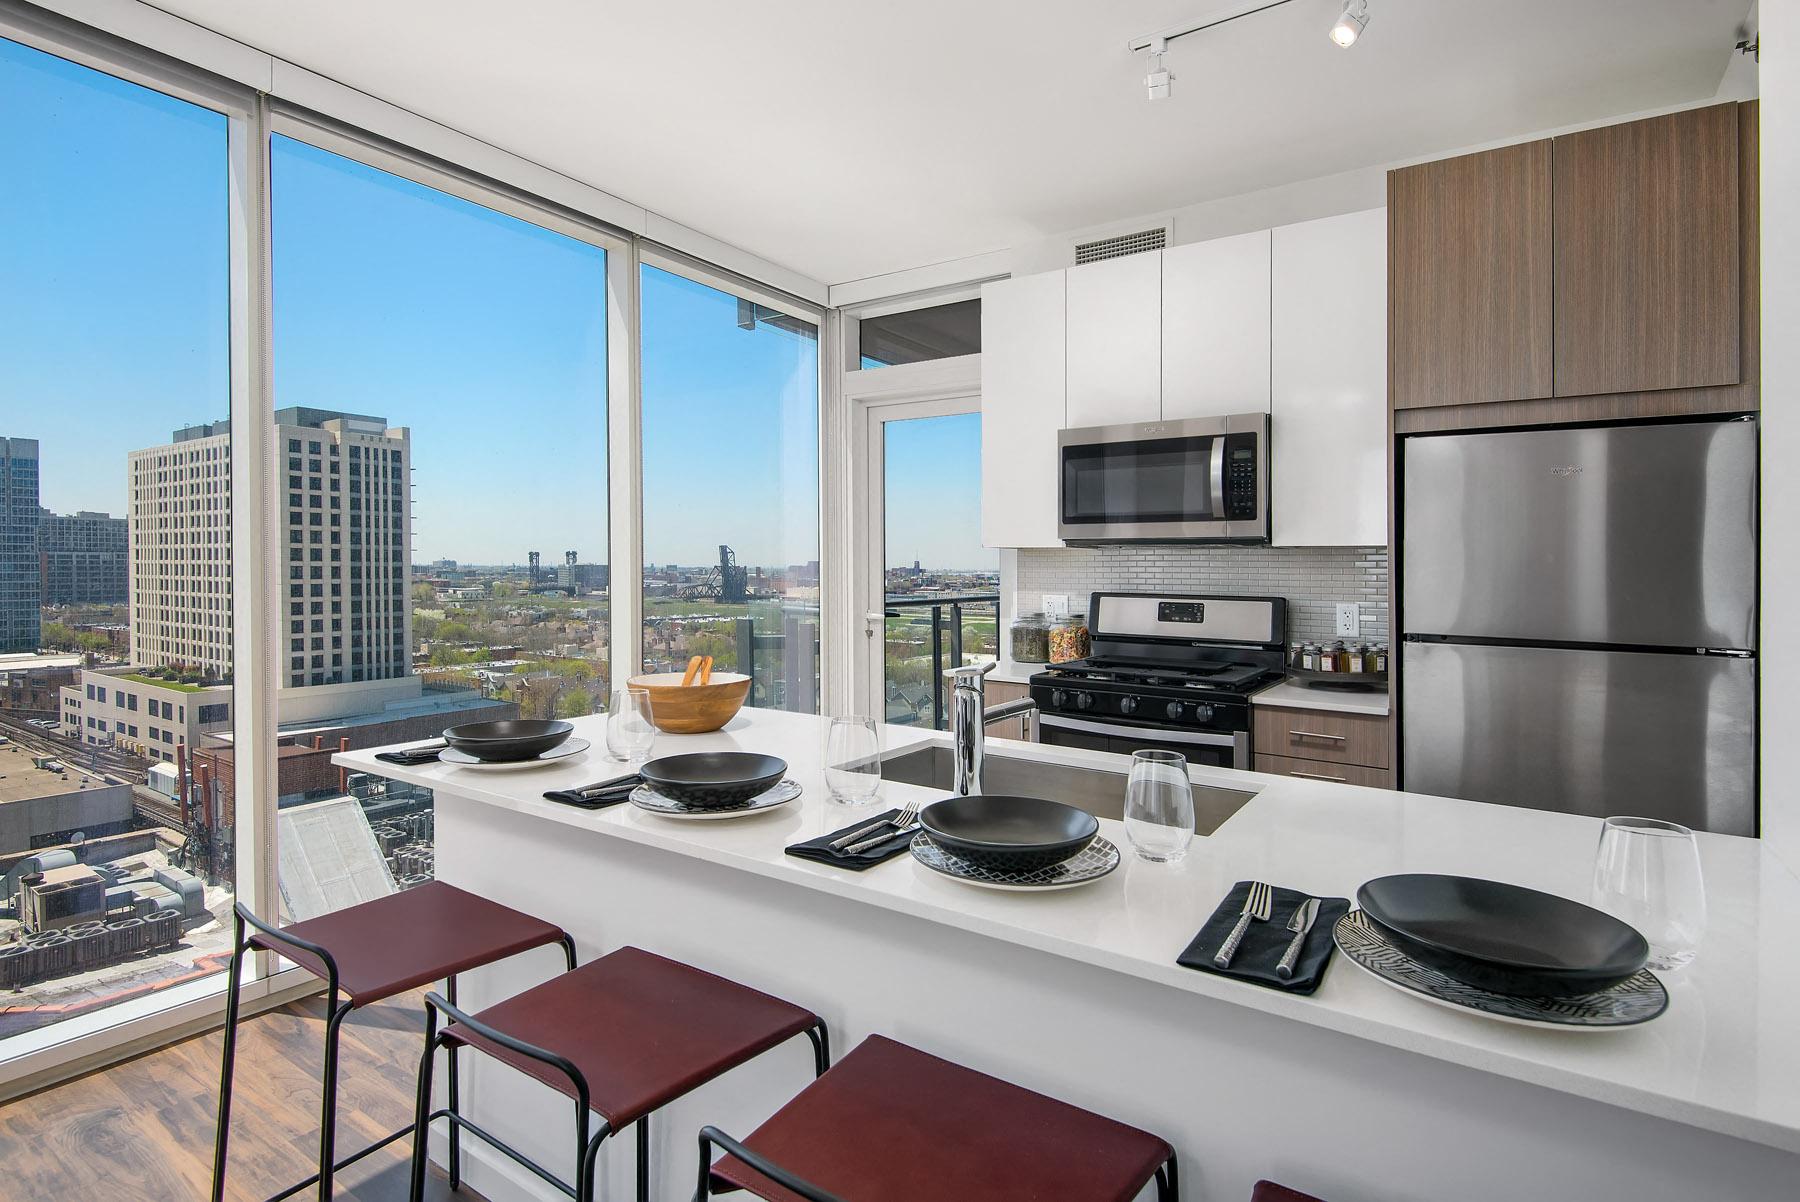 Modern kitchen with white cabinets and quartz kitchen countertops at Eleven40, Illinois